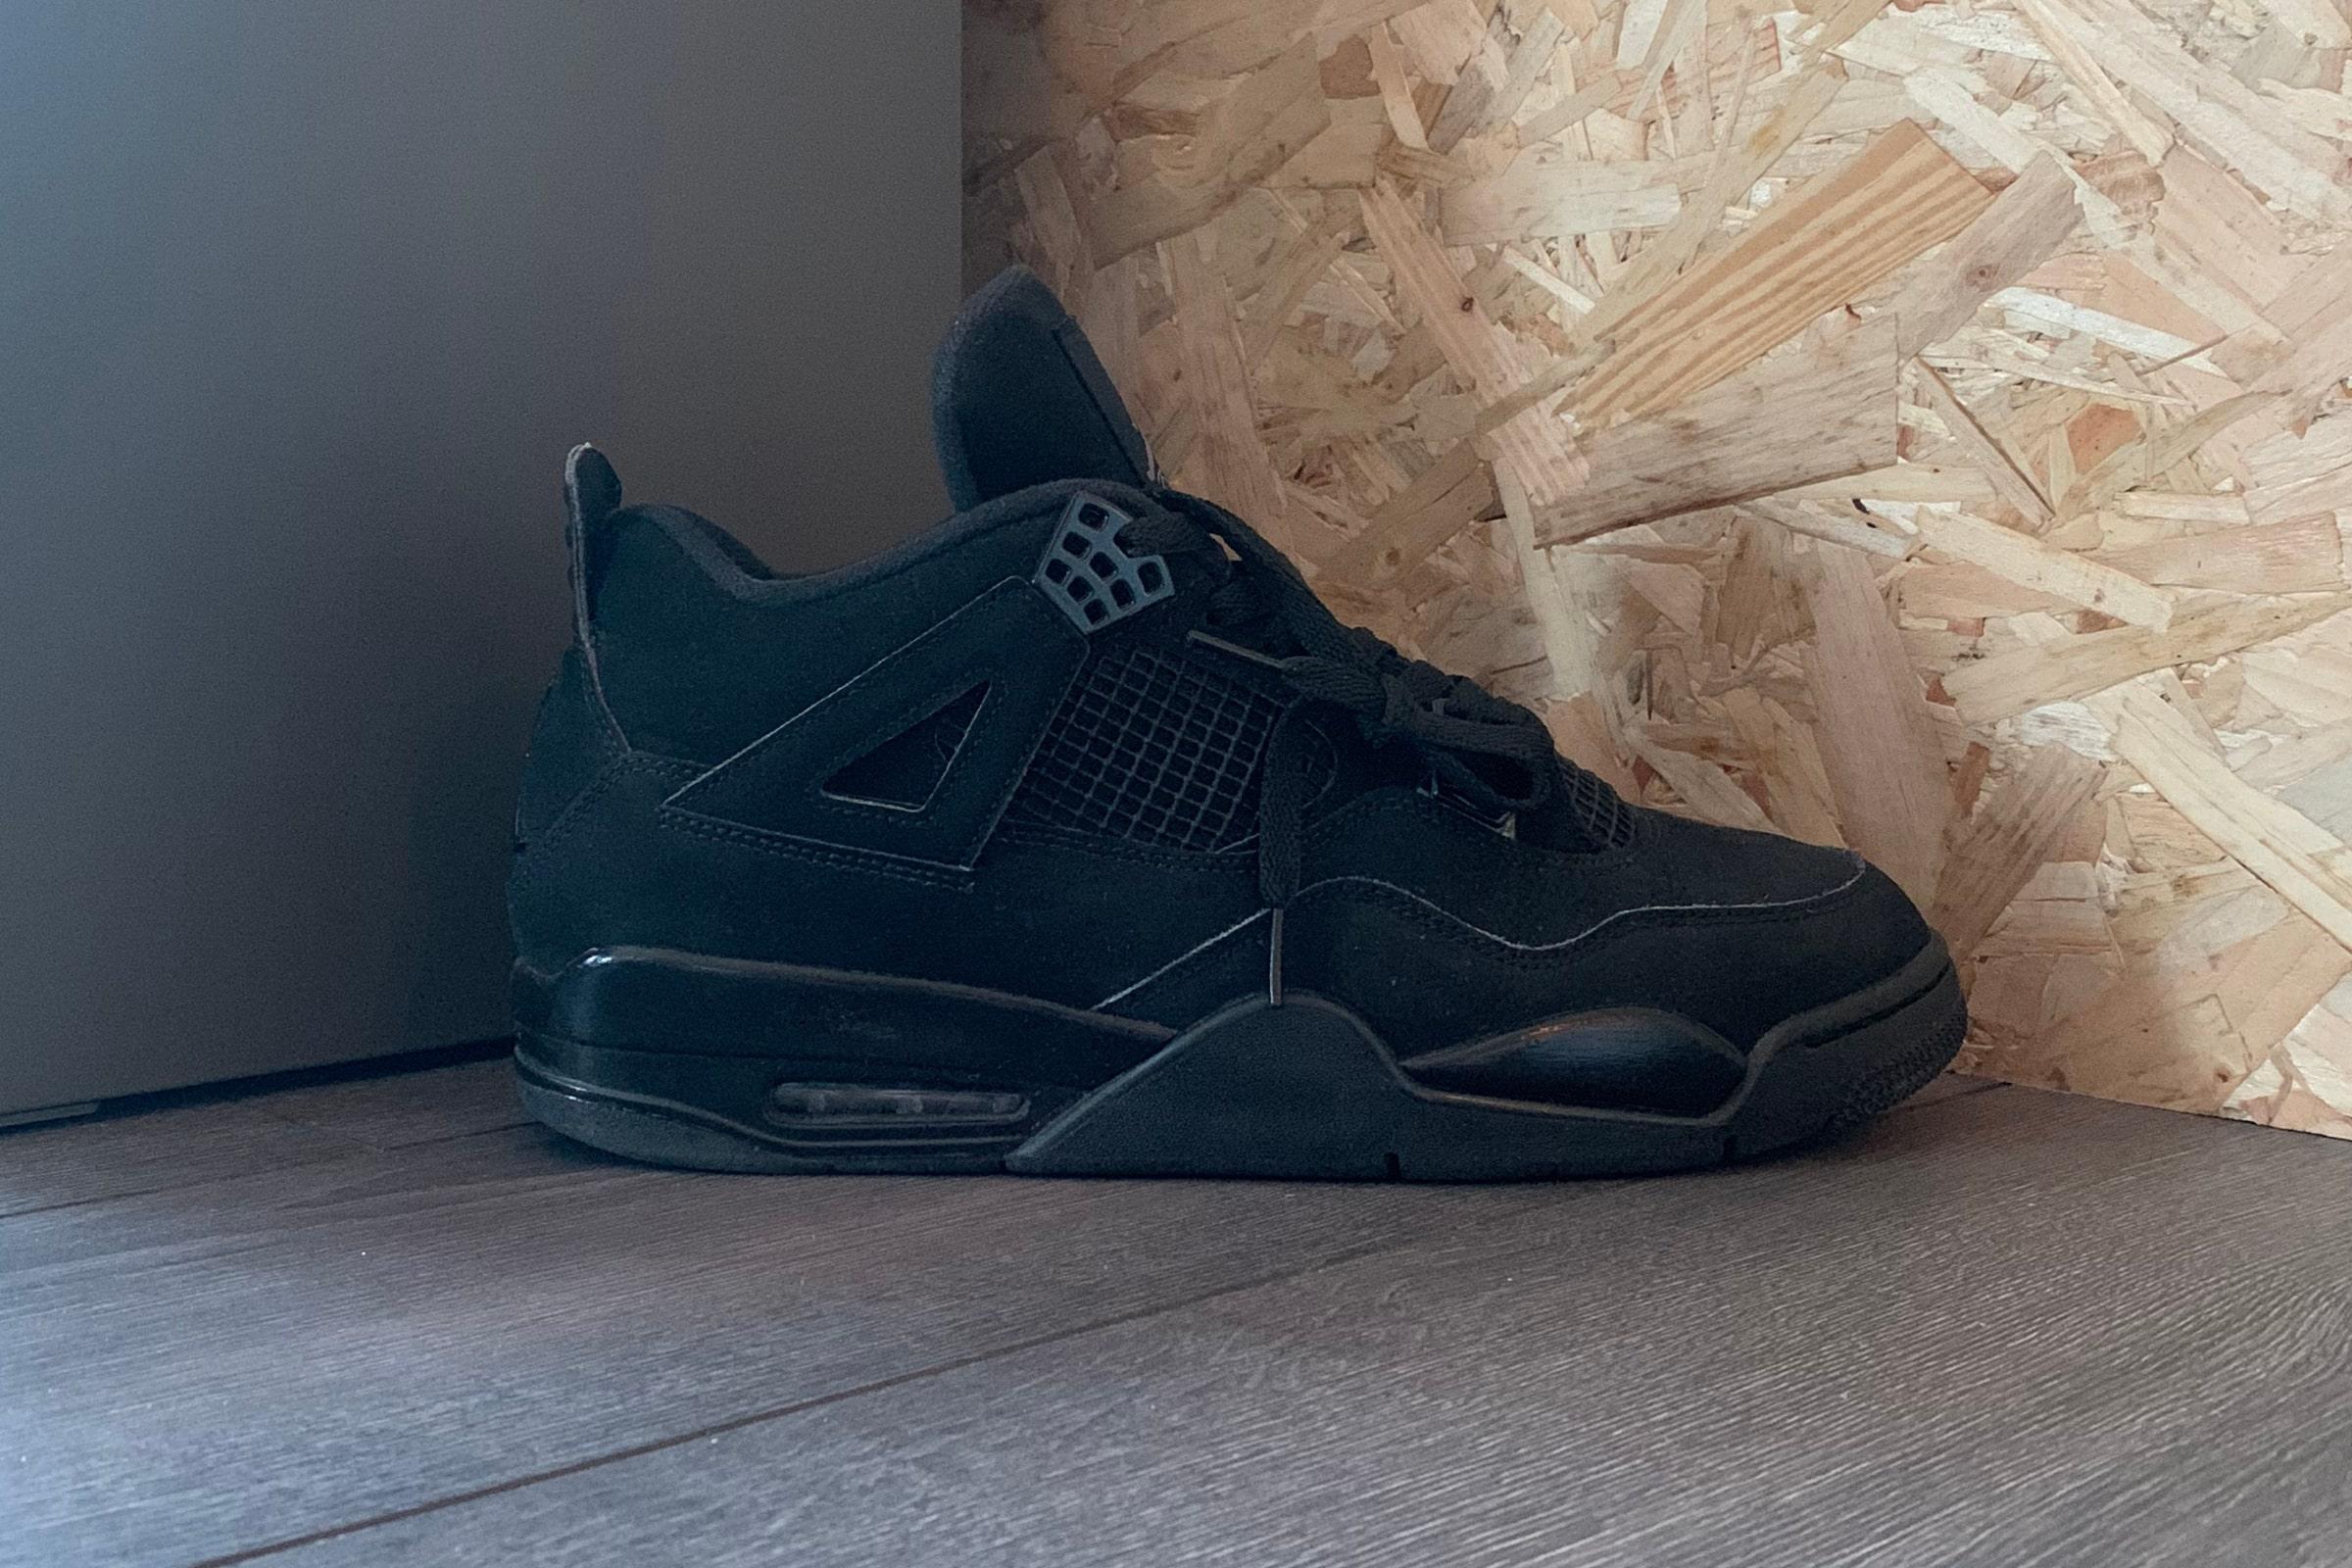 Nike Air Jordan 4 'Black Cat' - 2020